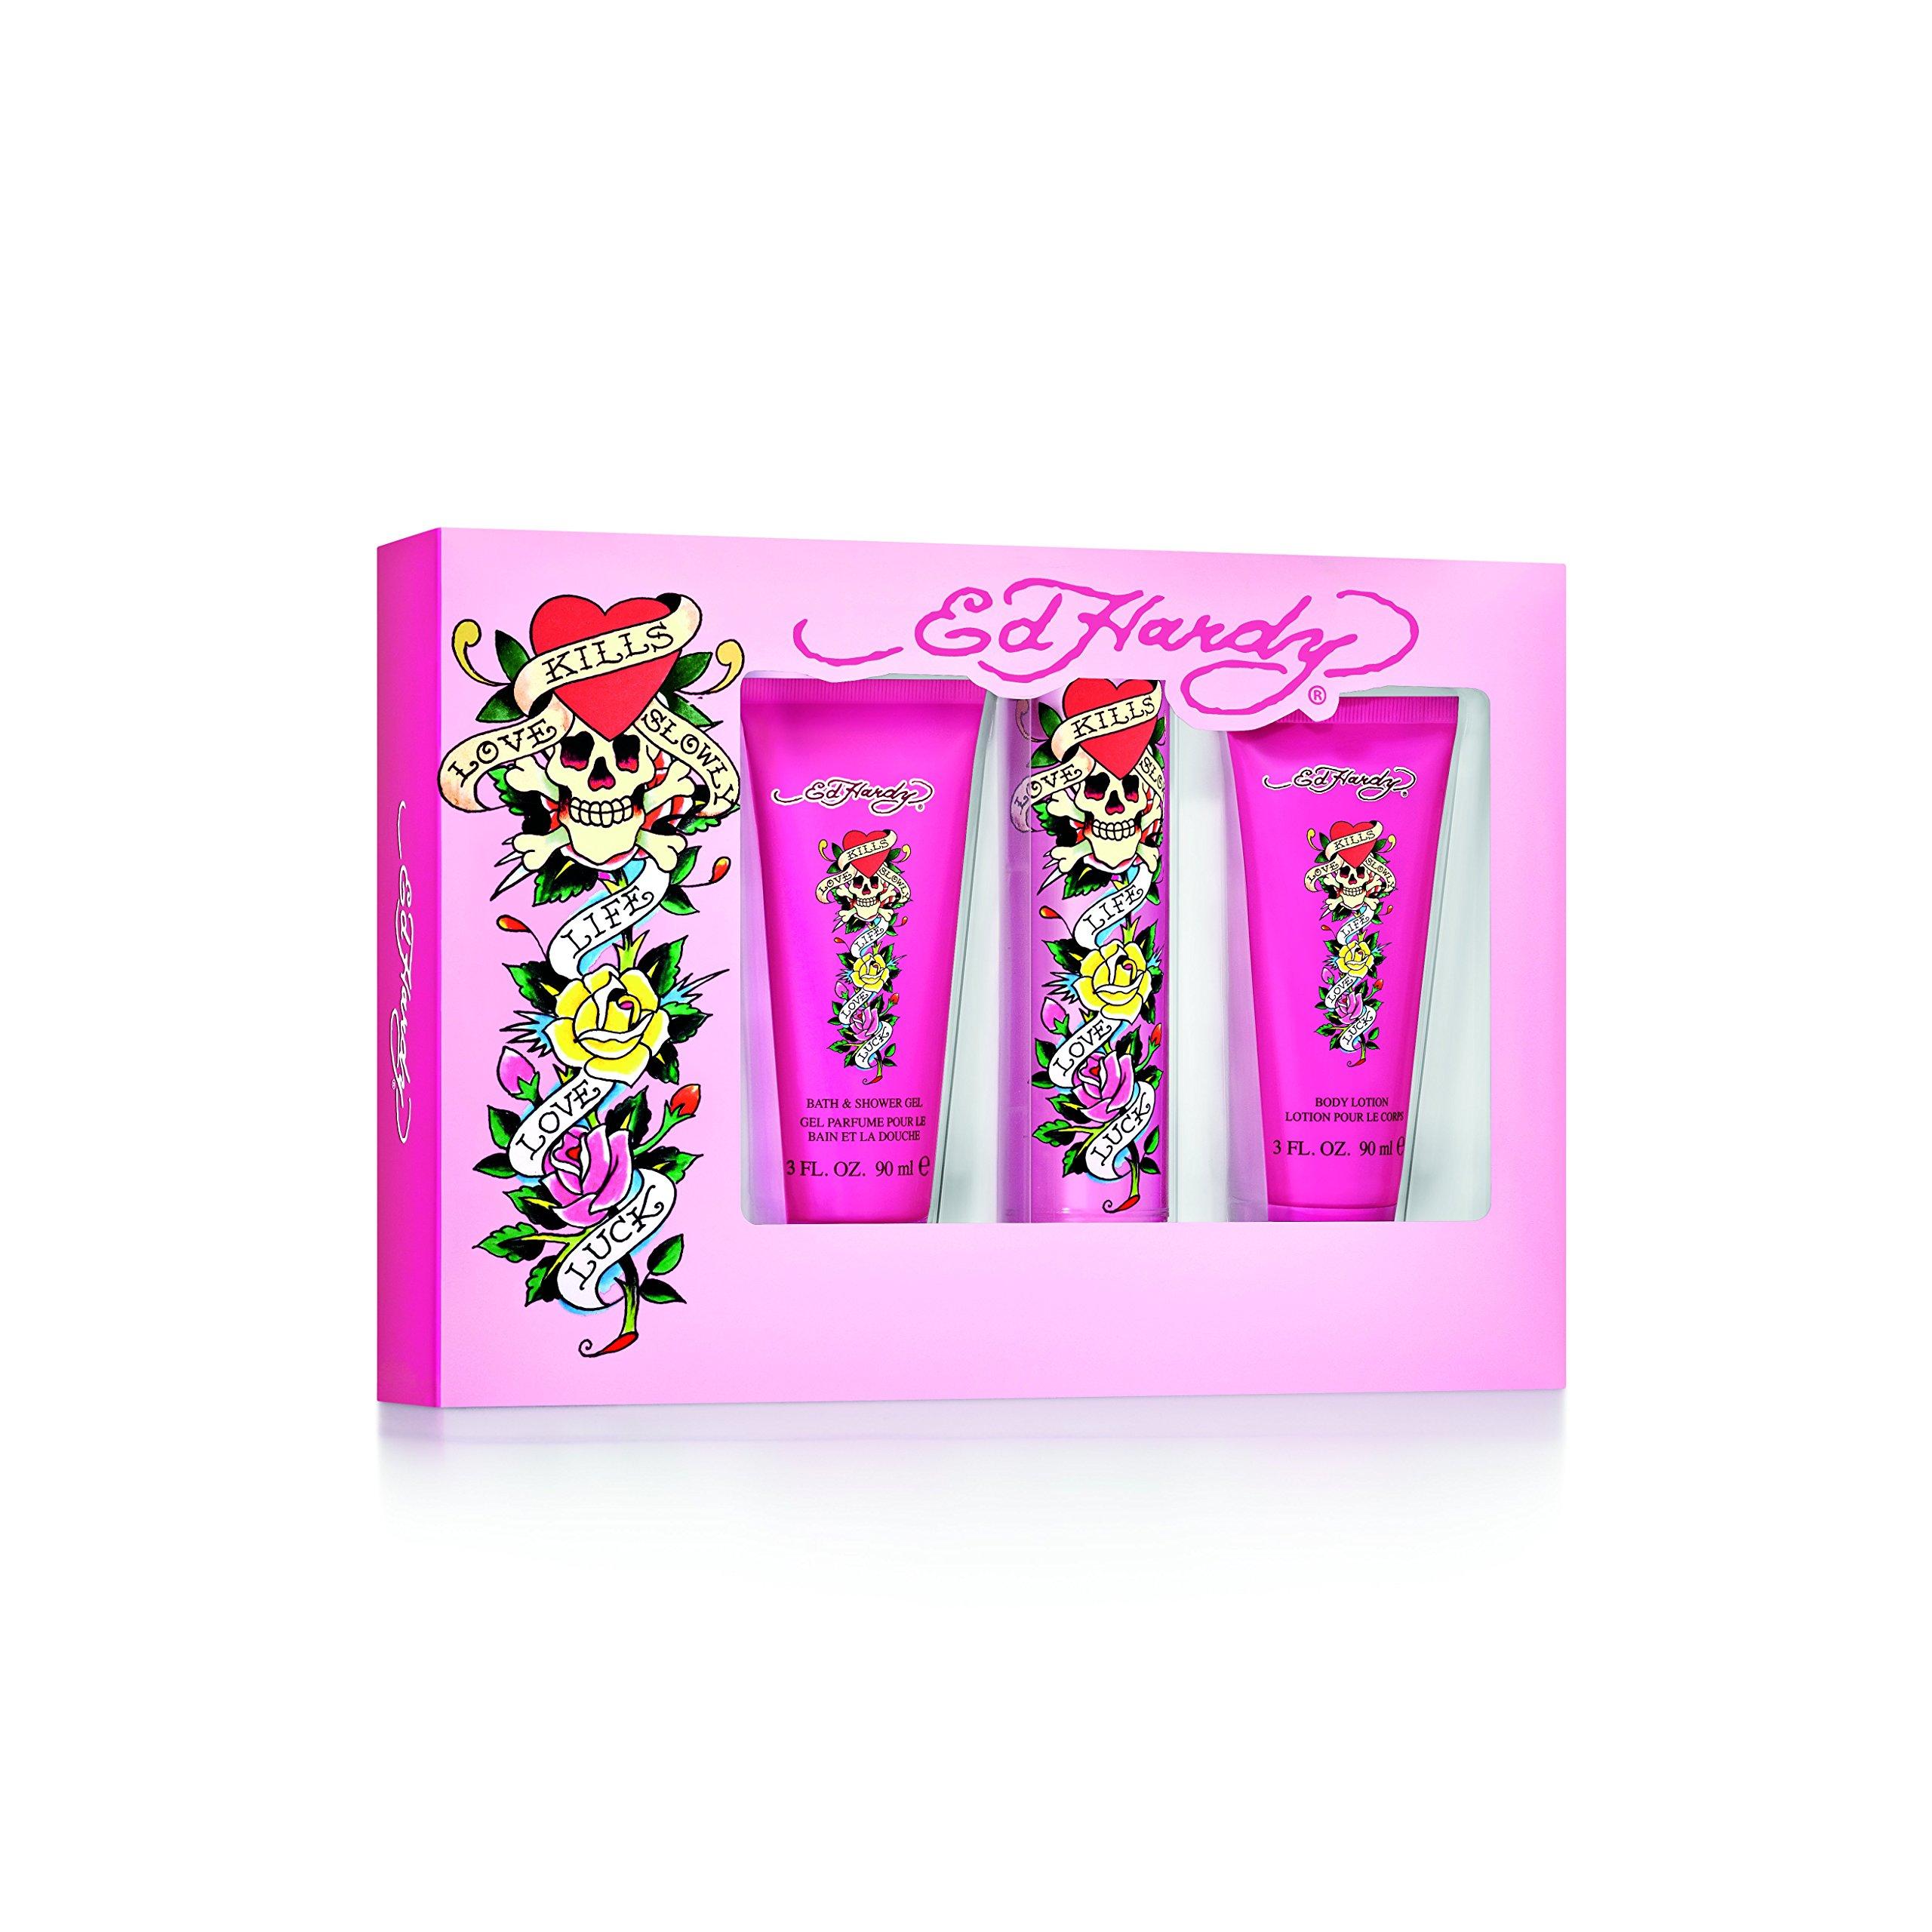 Ed Hardy Ladies Gift Set, 1 Count